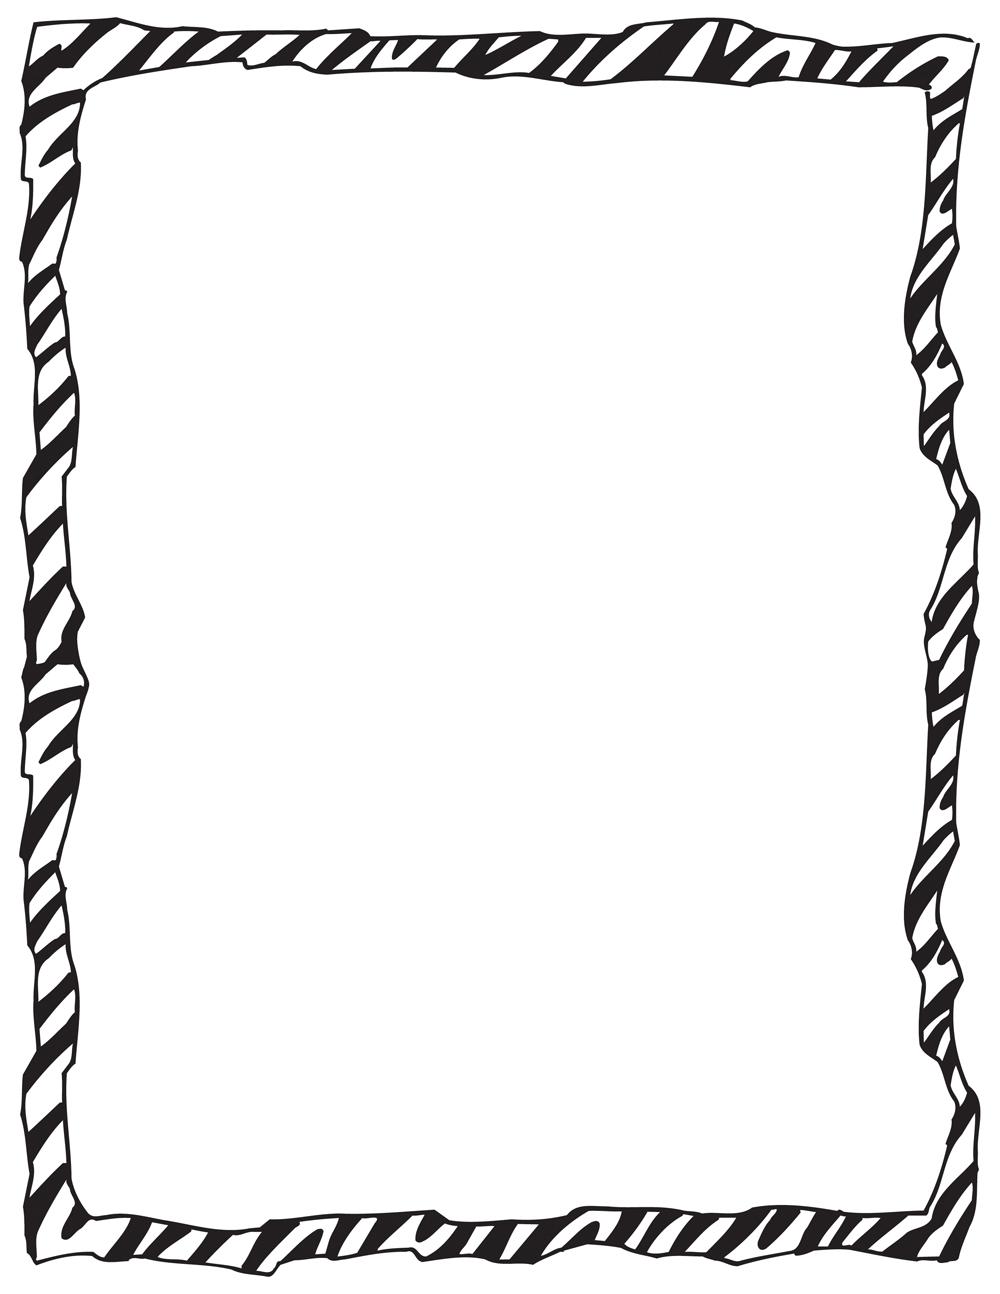 Zebra Print Border ClipArt Best